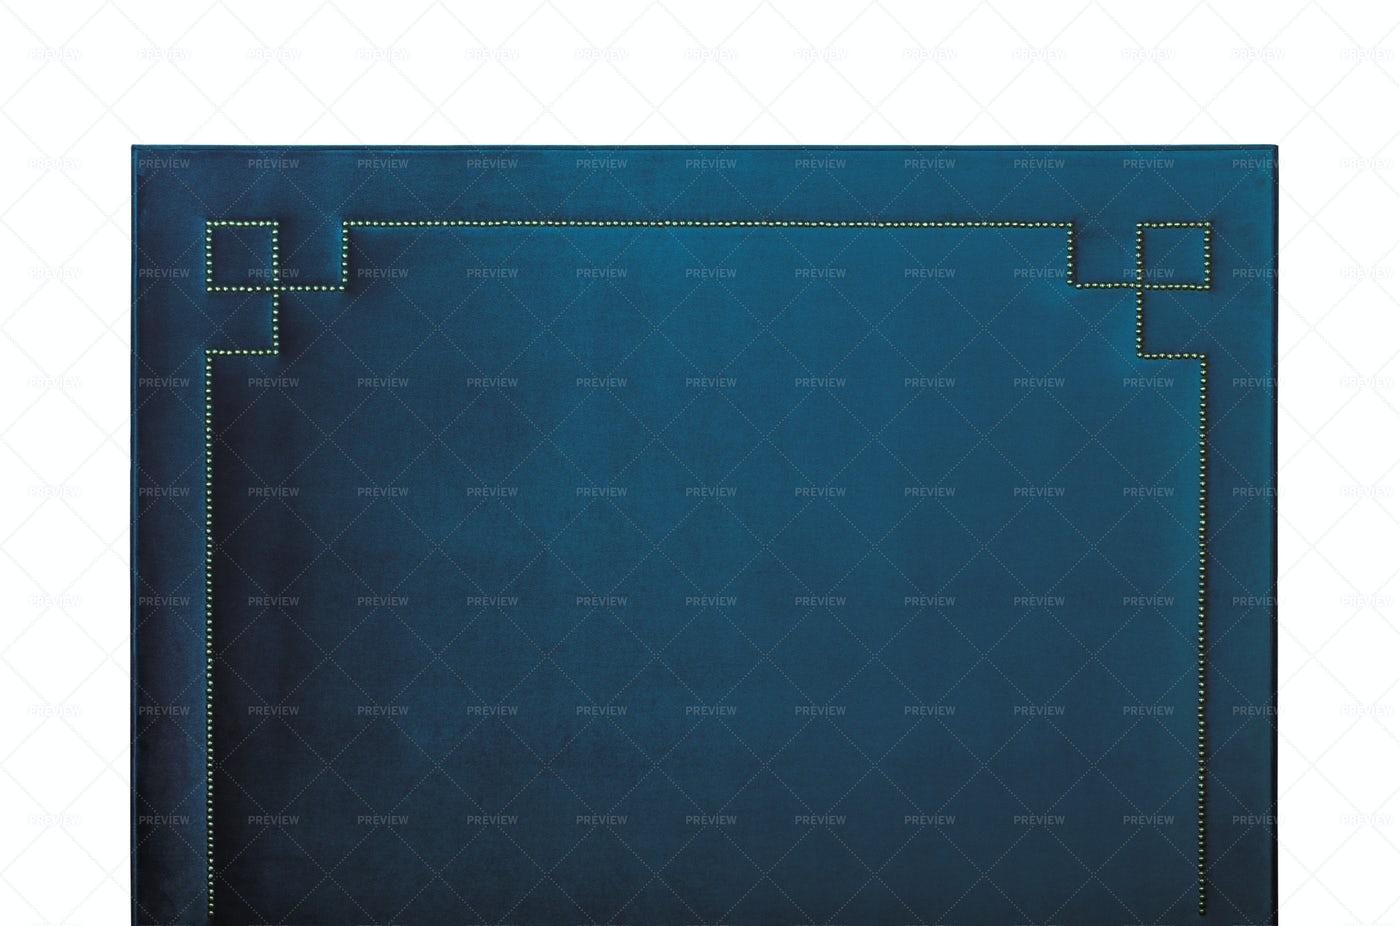 Blue Velvet Headboard Isolated: Stock Photos